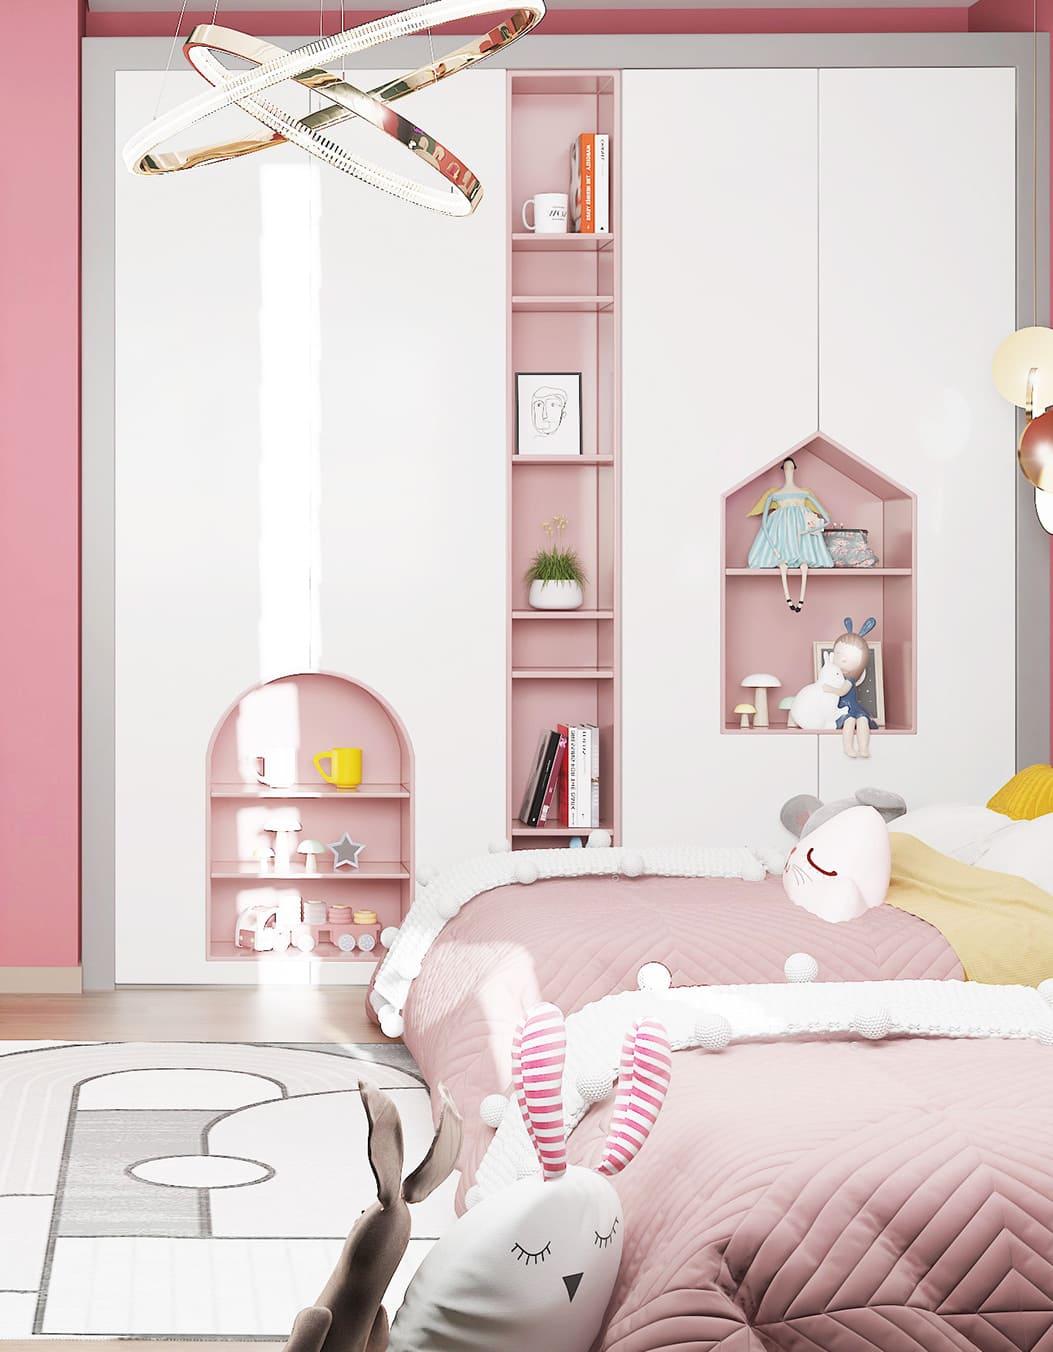 интерьер детской комнаты фото 24